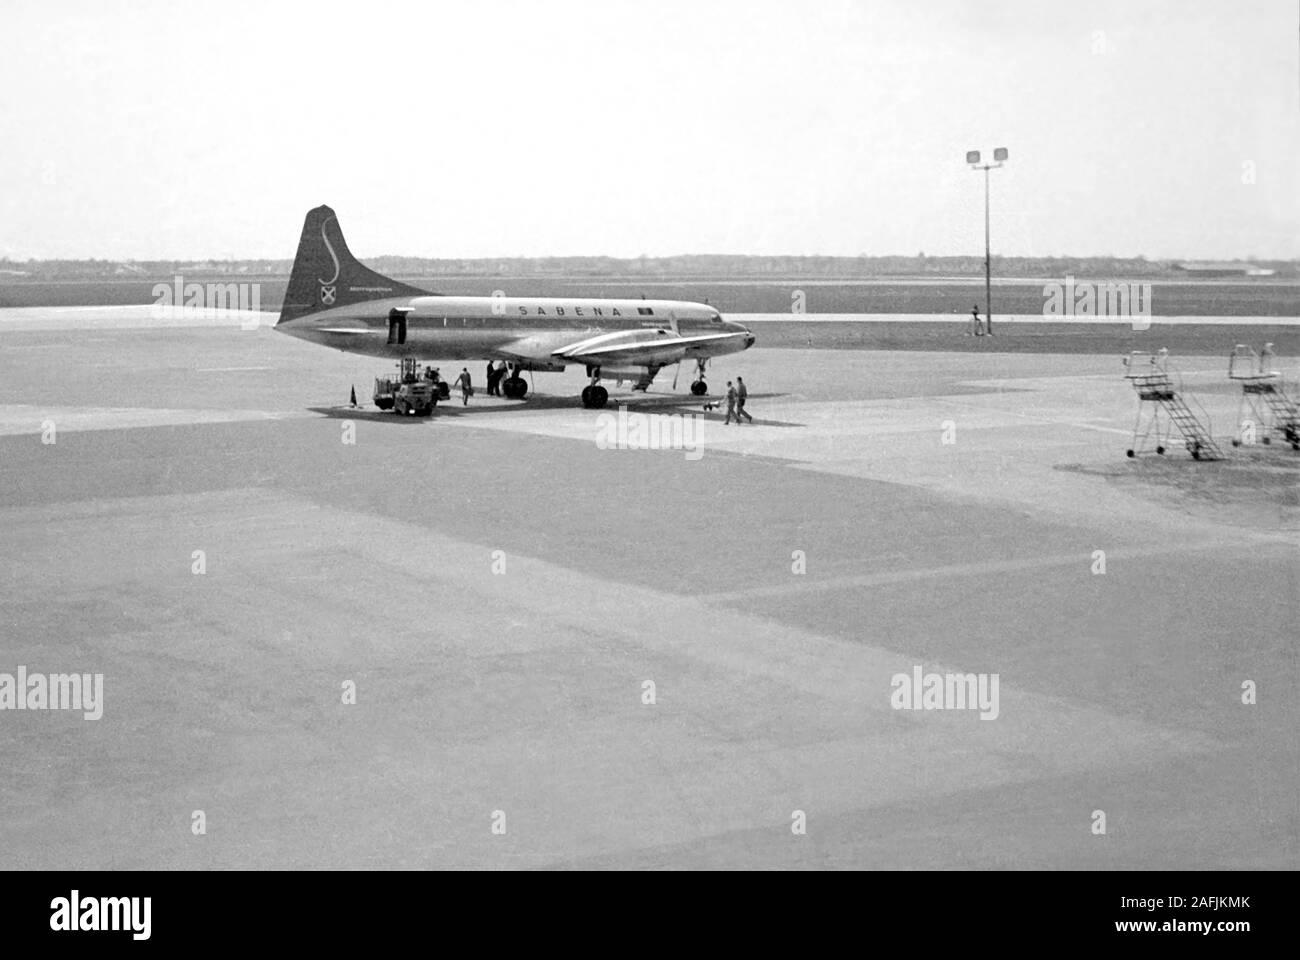 Sabena aircraft on the Munich-Riem Airport. Stock Photo